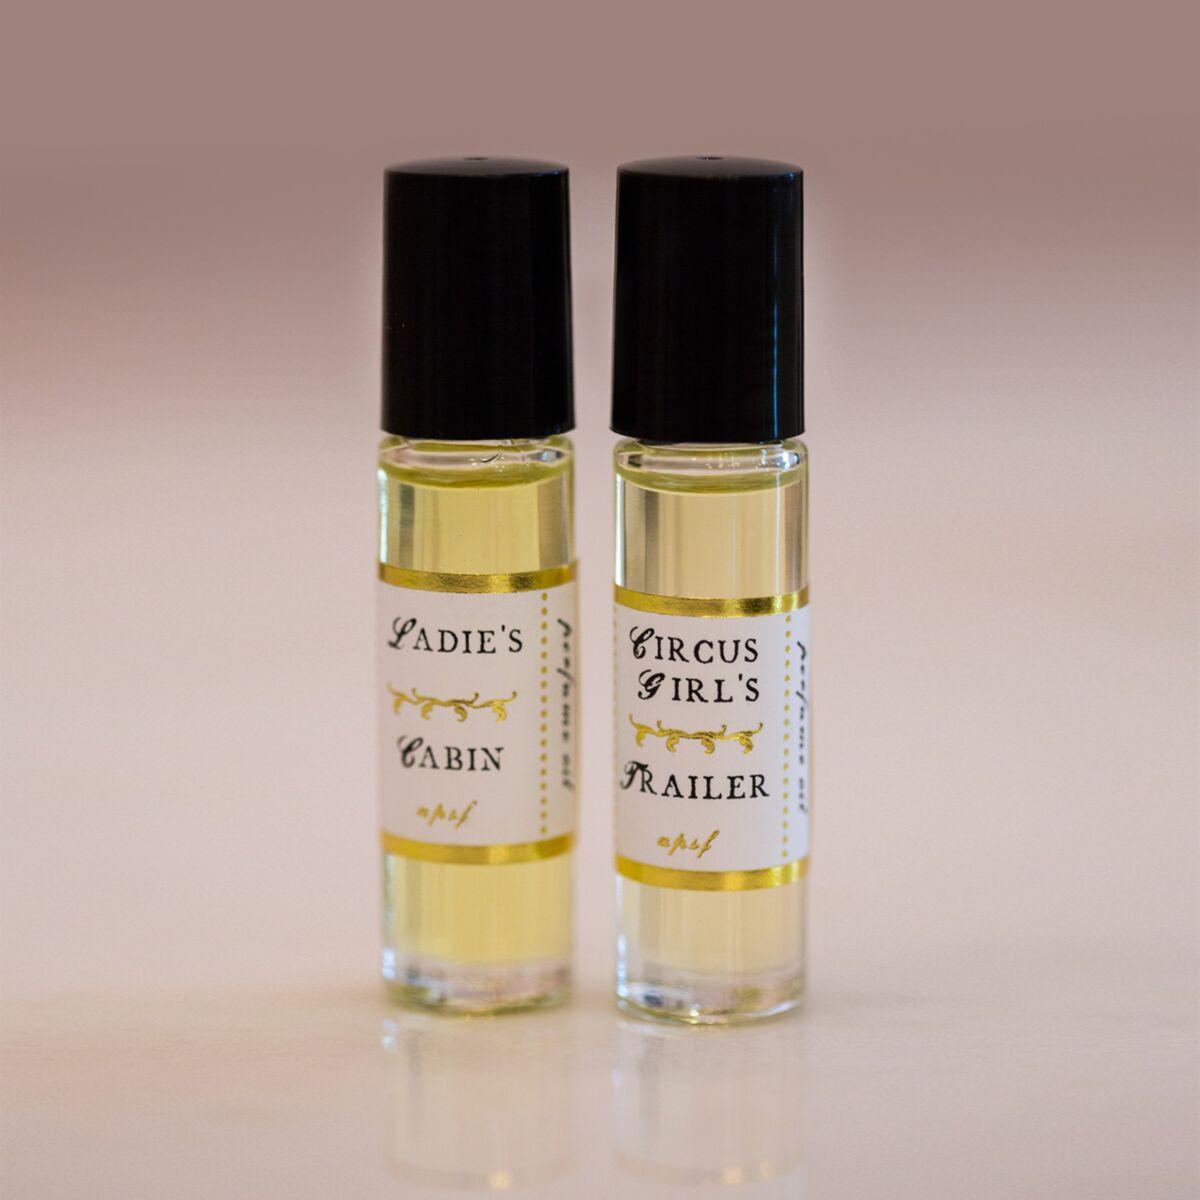 Circus Girls Trailer Perfume image